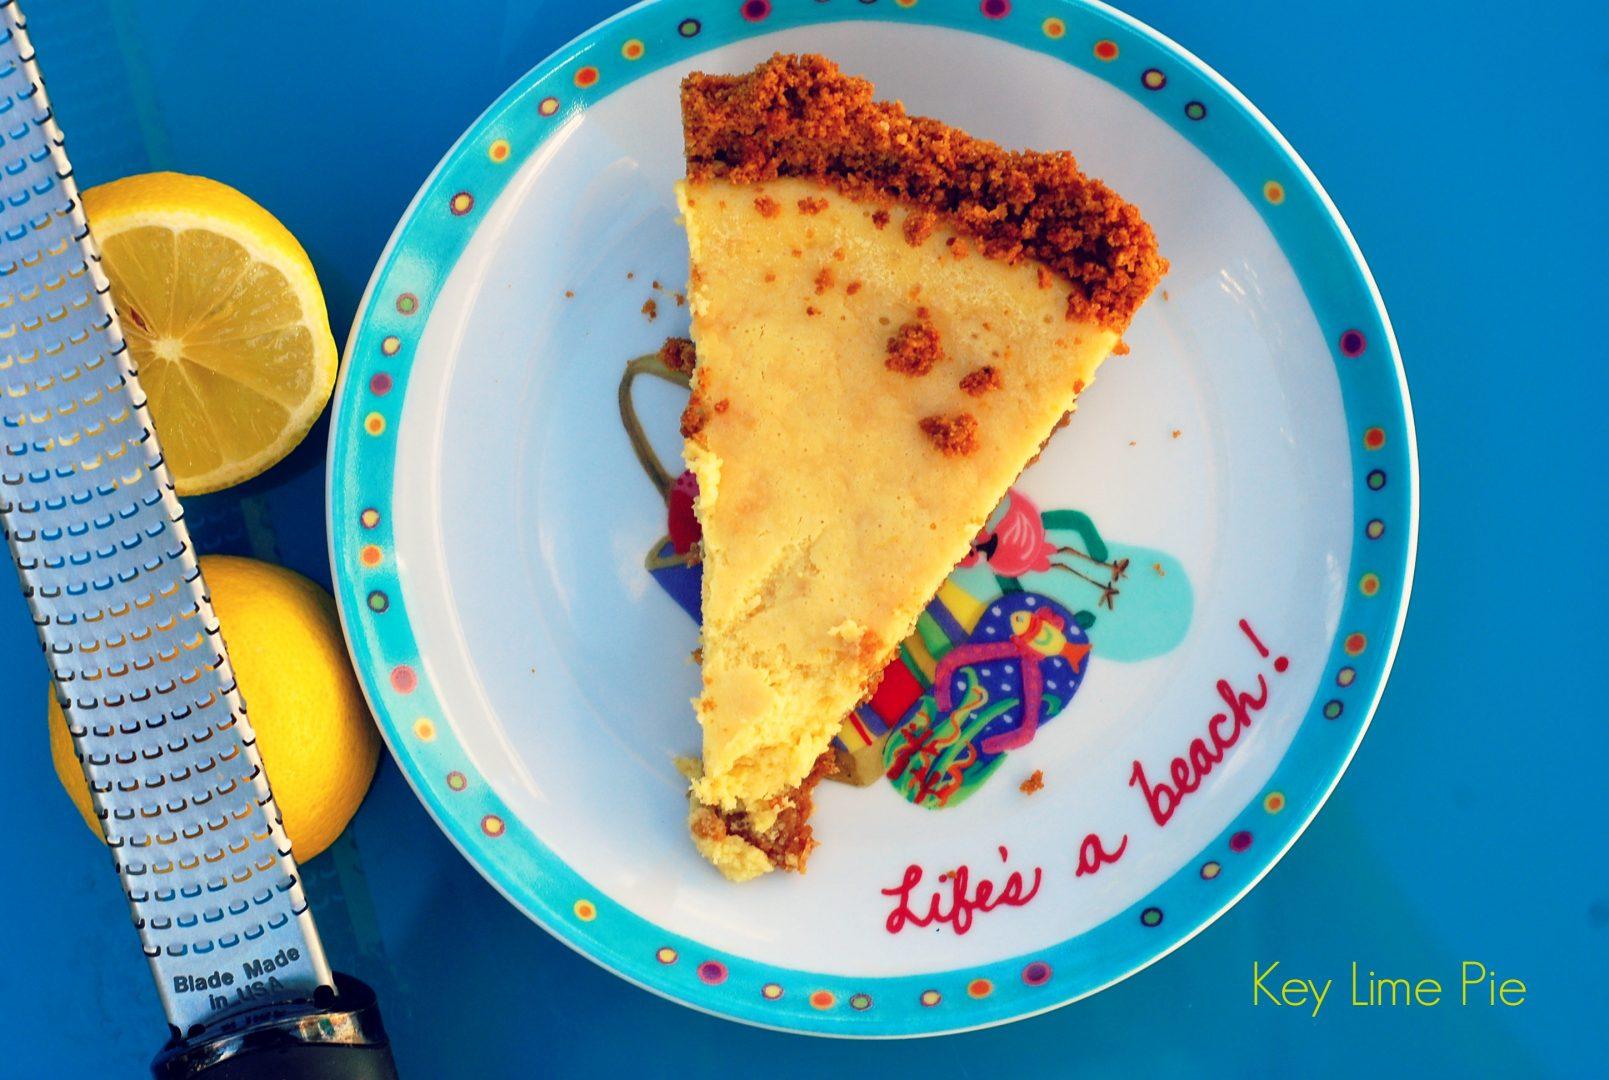 authentic key lime pie recipe